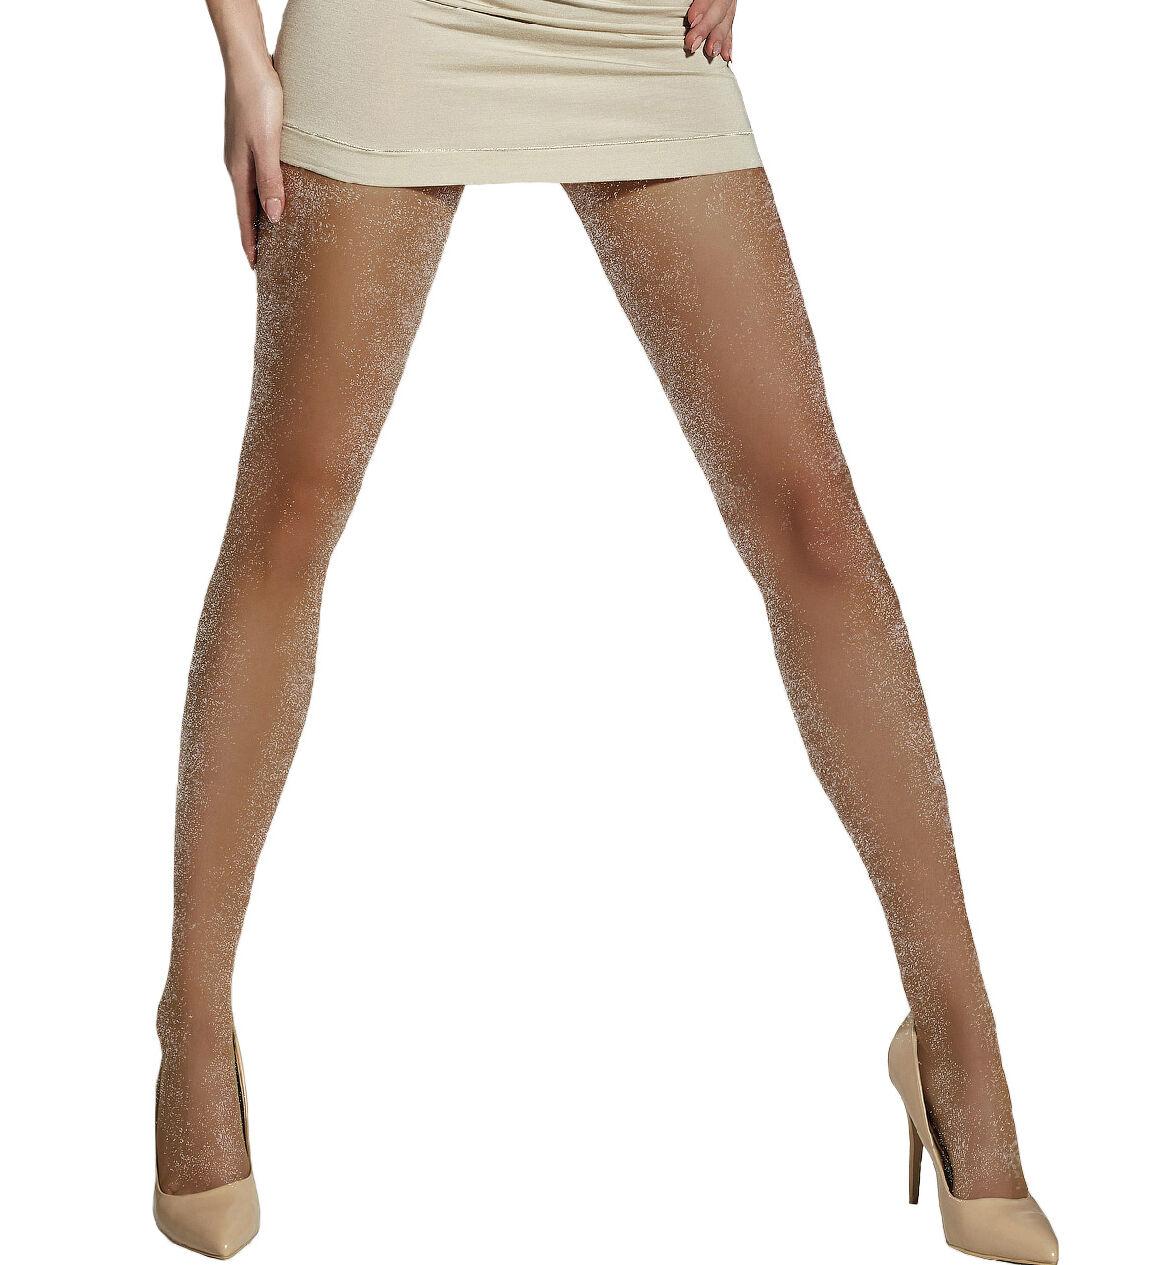 Air Hostess Cabin Crew 40 Den Womens Glossy Semi Opaque Tights Pantyhose Paulla